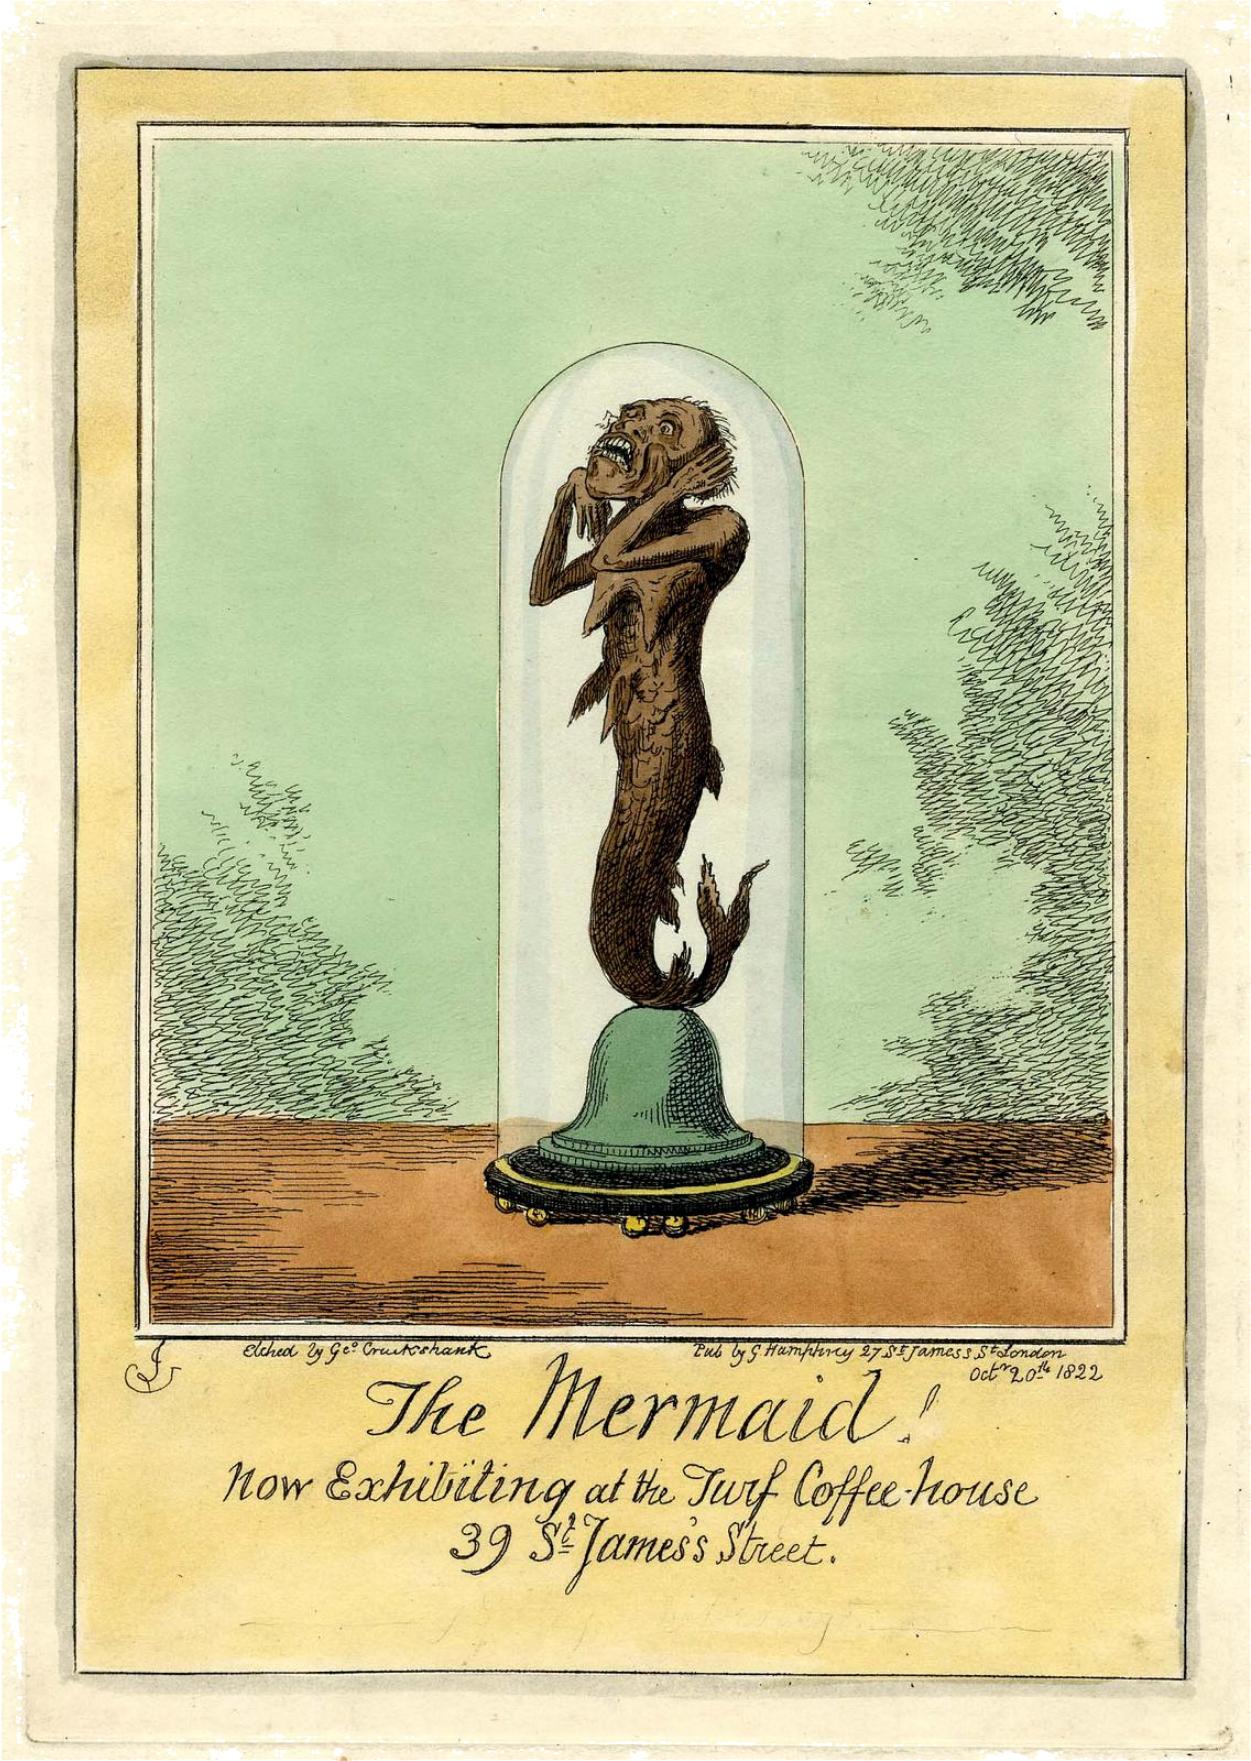 File:Fiji mermaid 1822 ad.jpg